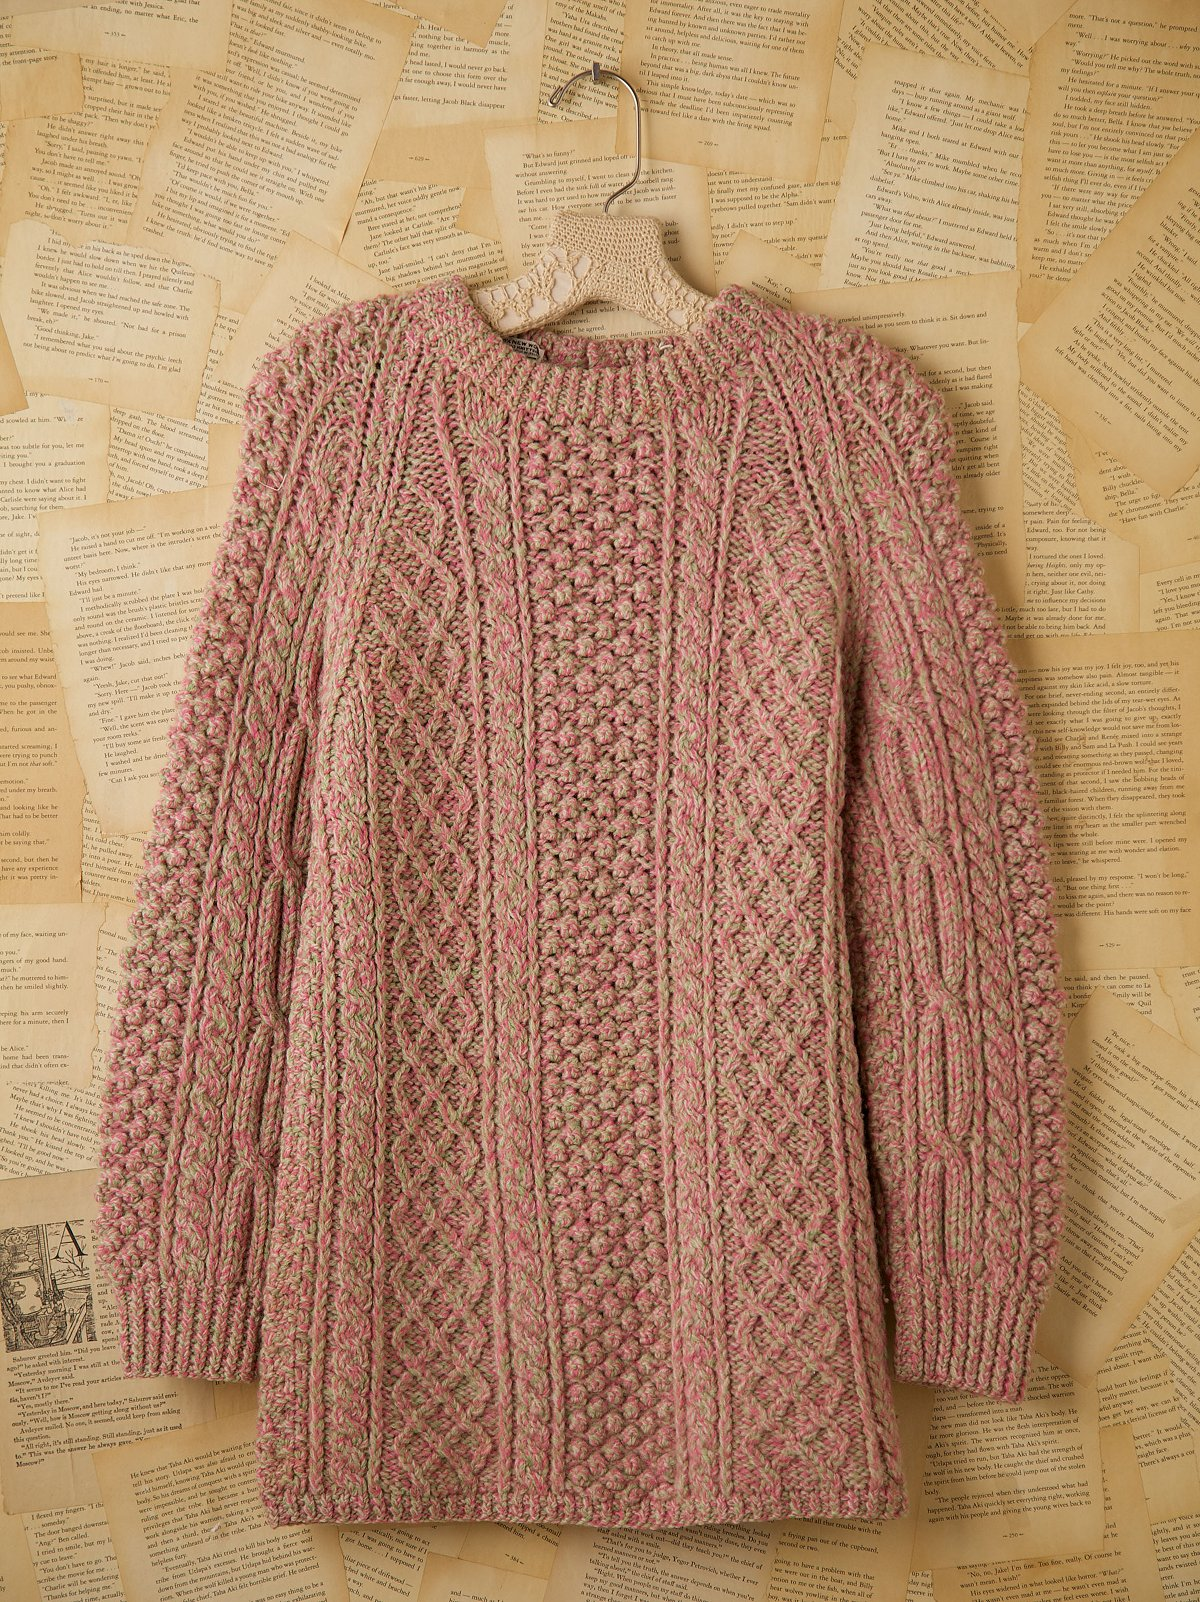 Vintage Hand-Knit Fisherman Sweater